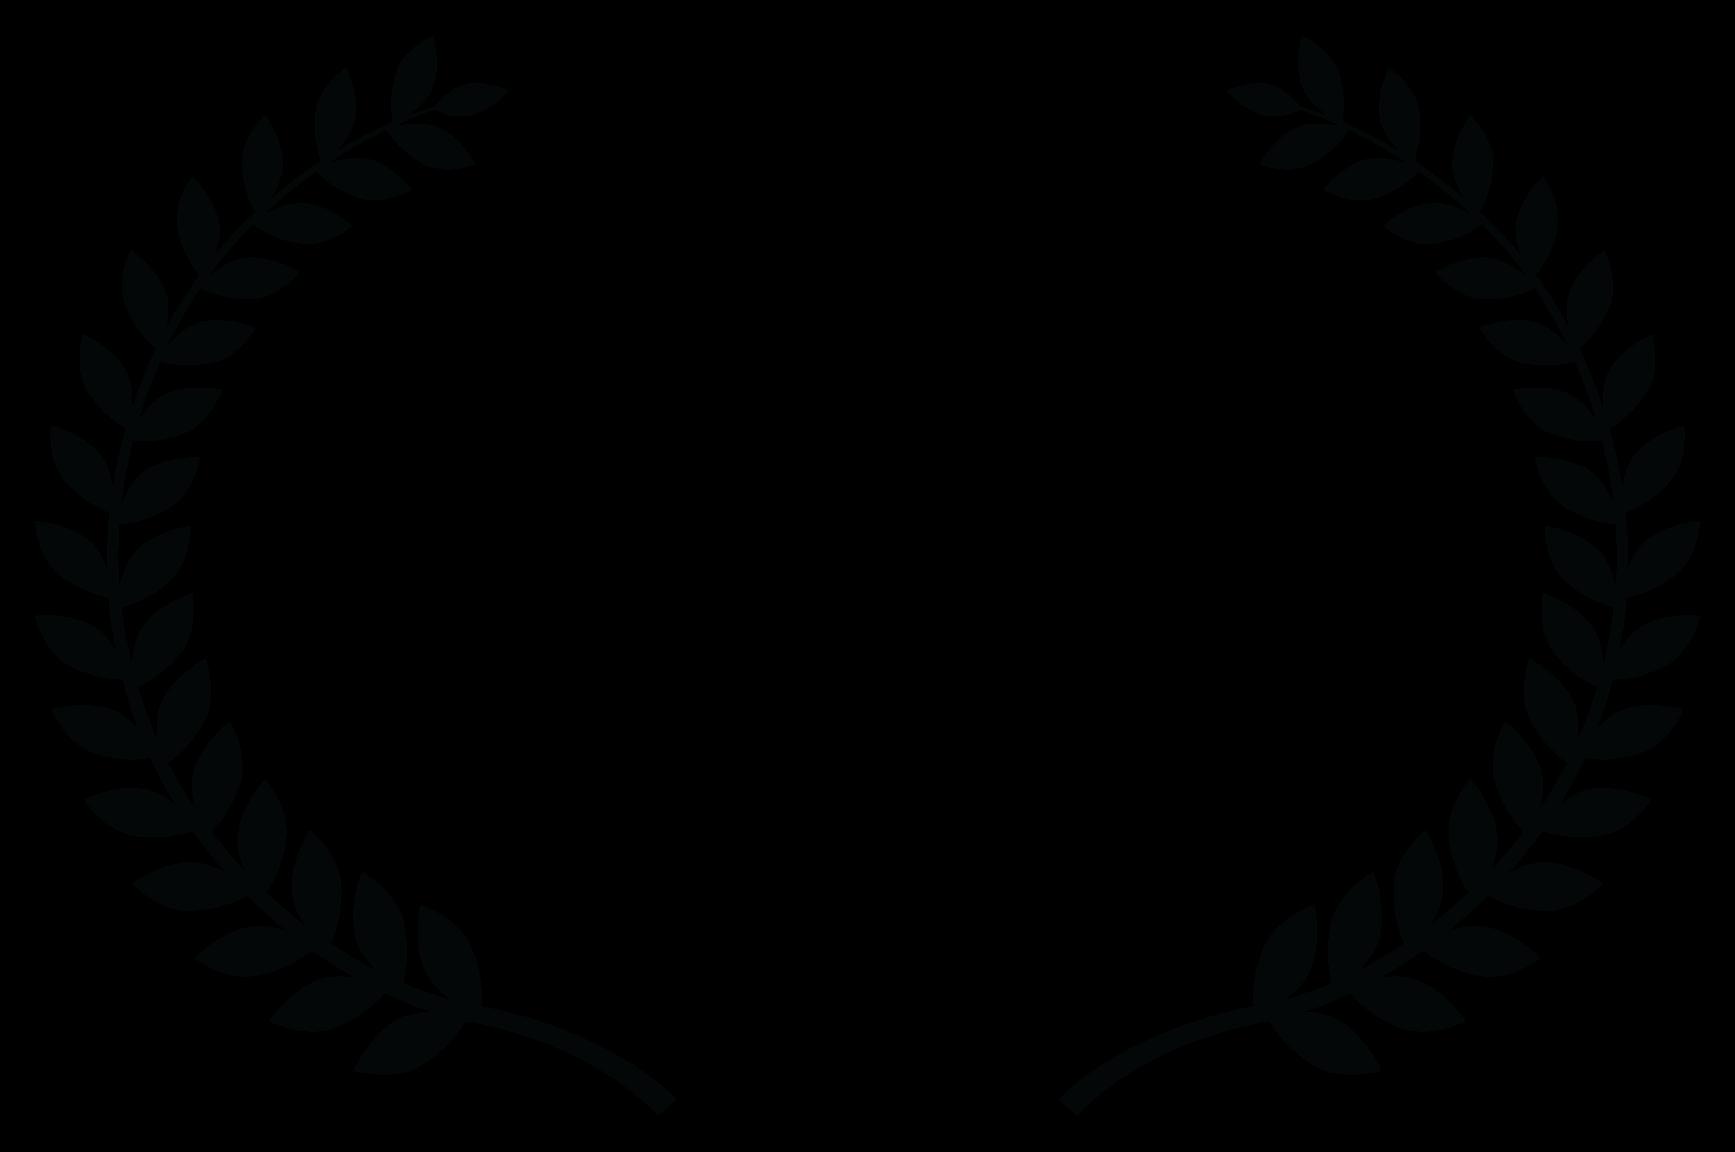 BEST ACTRESS WINNER - IntInd Film Awards - Black.png